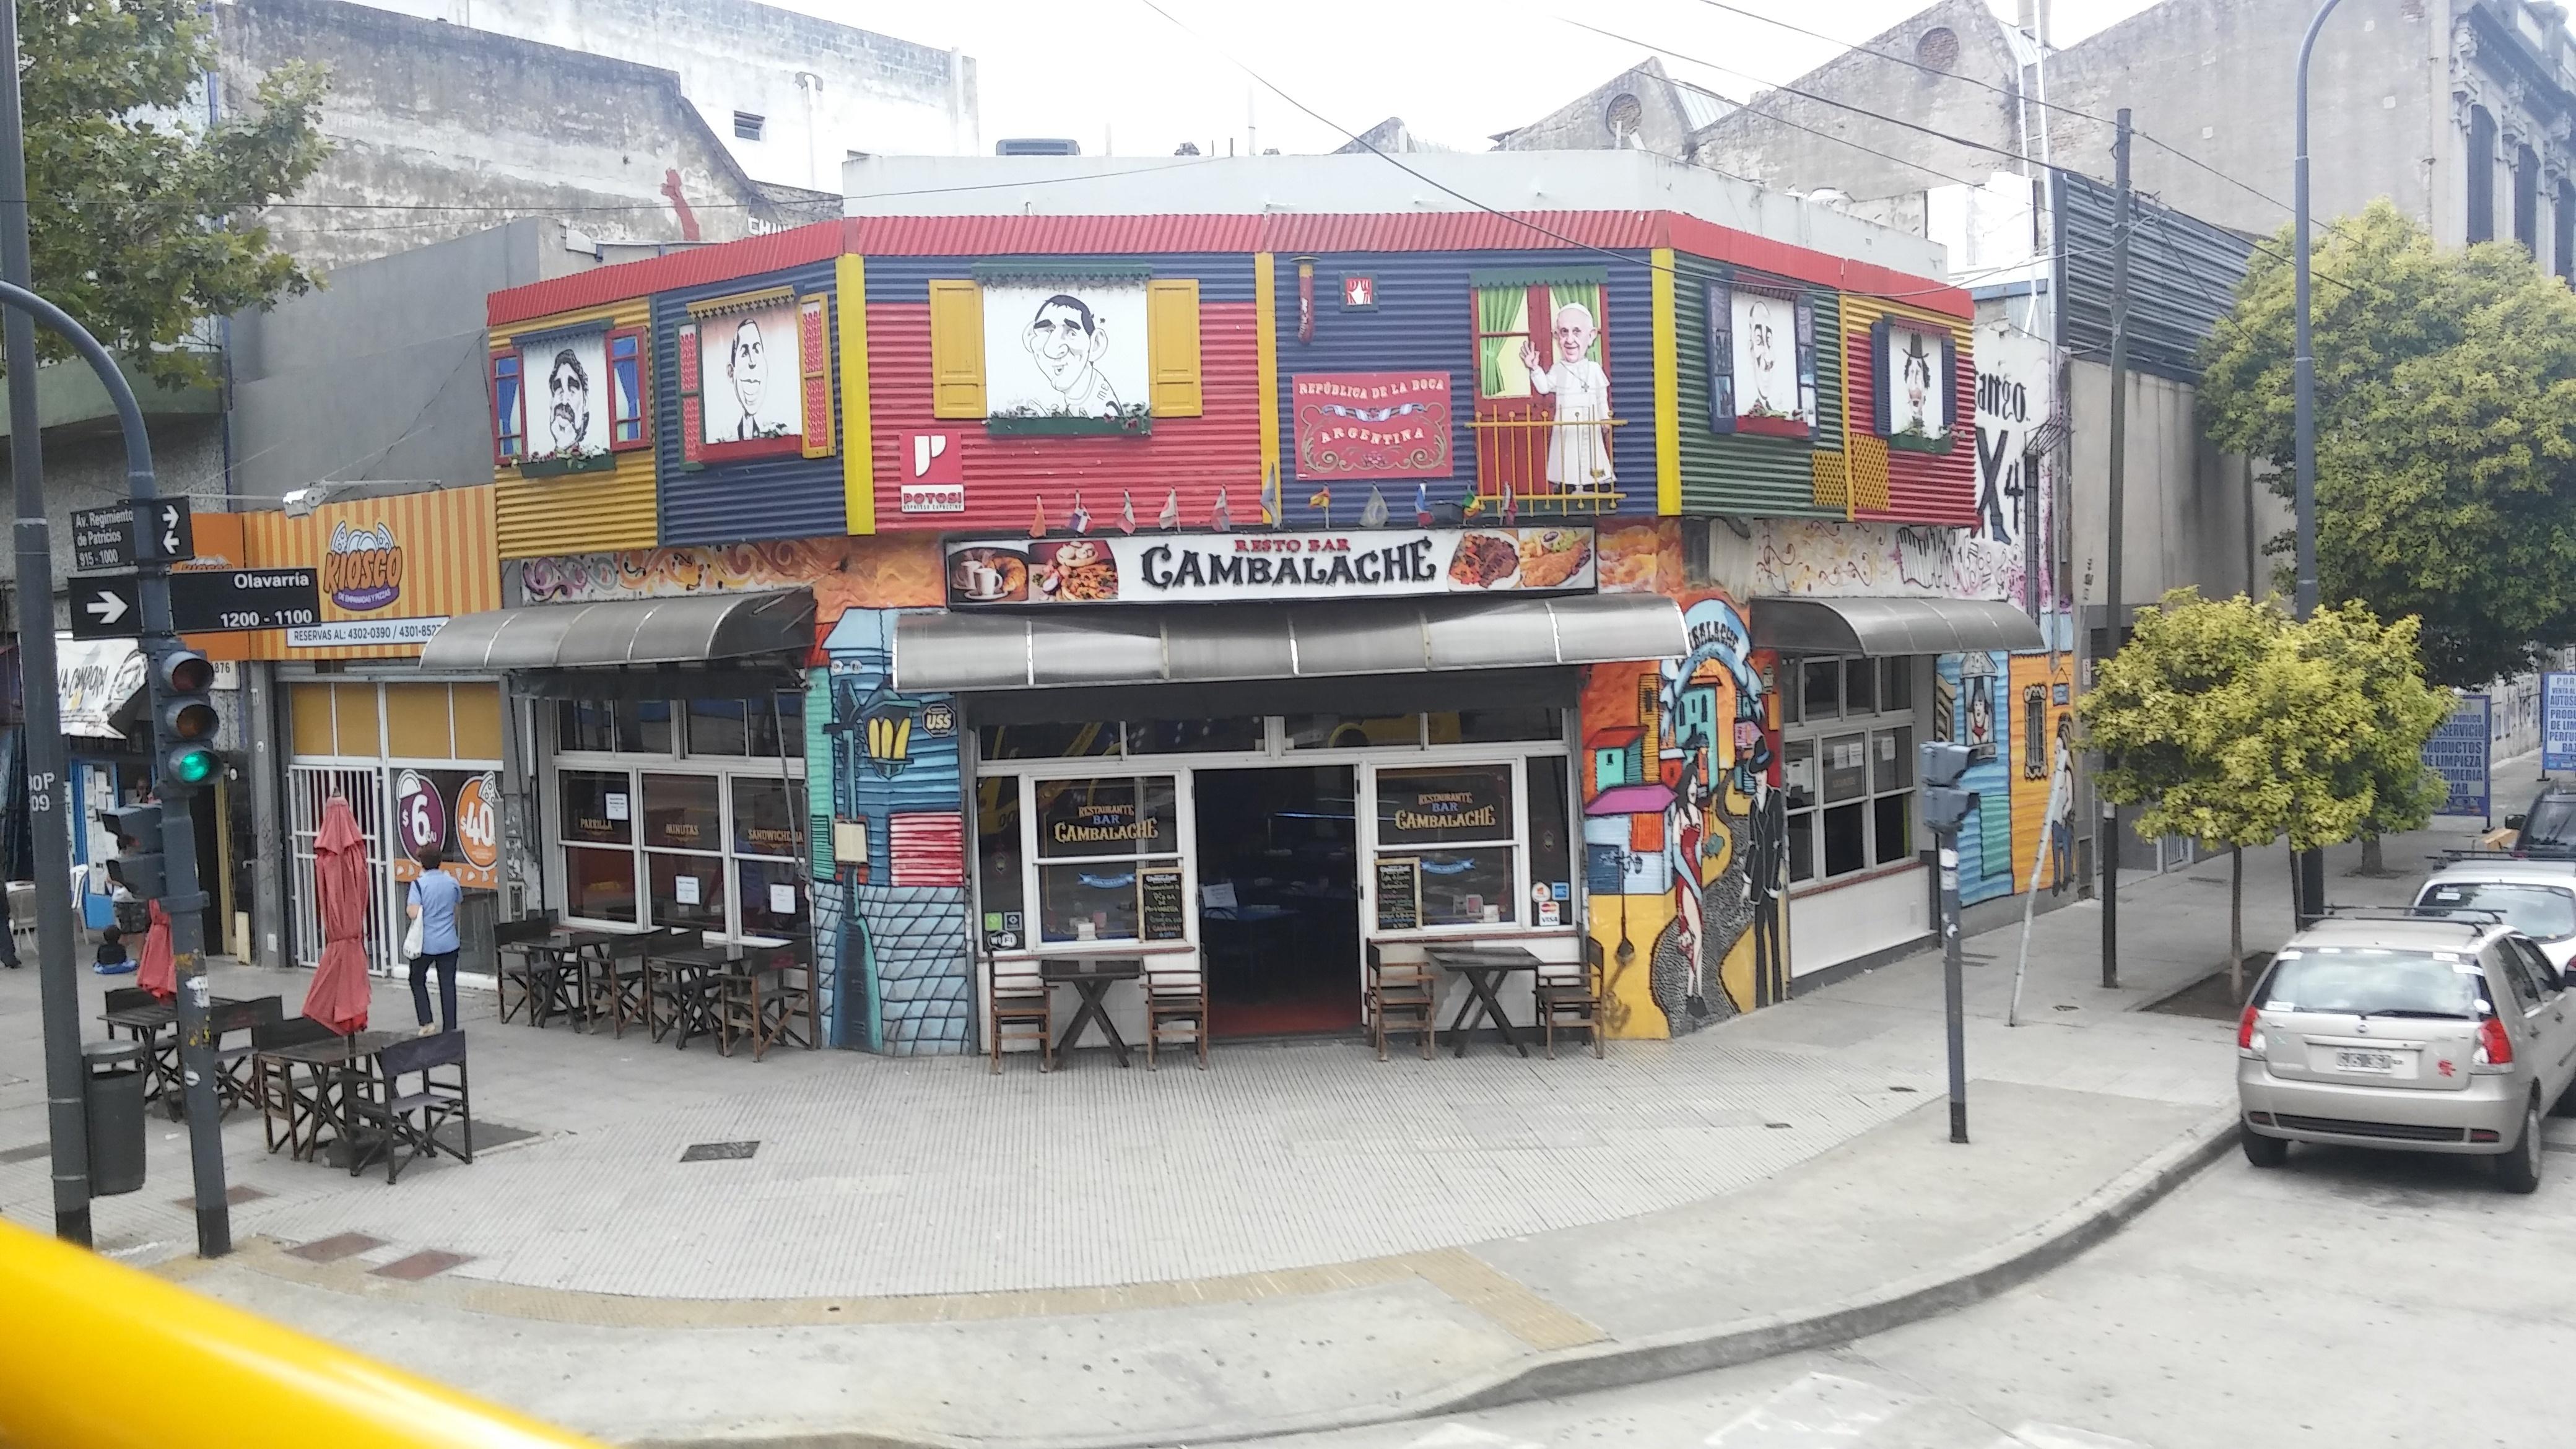 CAPAStudyAbroad_BuenosAires_Spring2016_From_Liz_Hendry_-_La_Boca_3.jpg